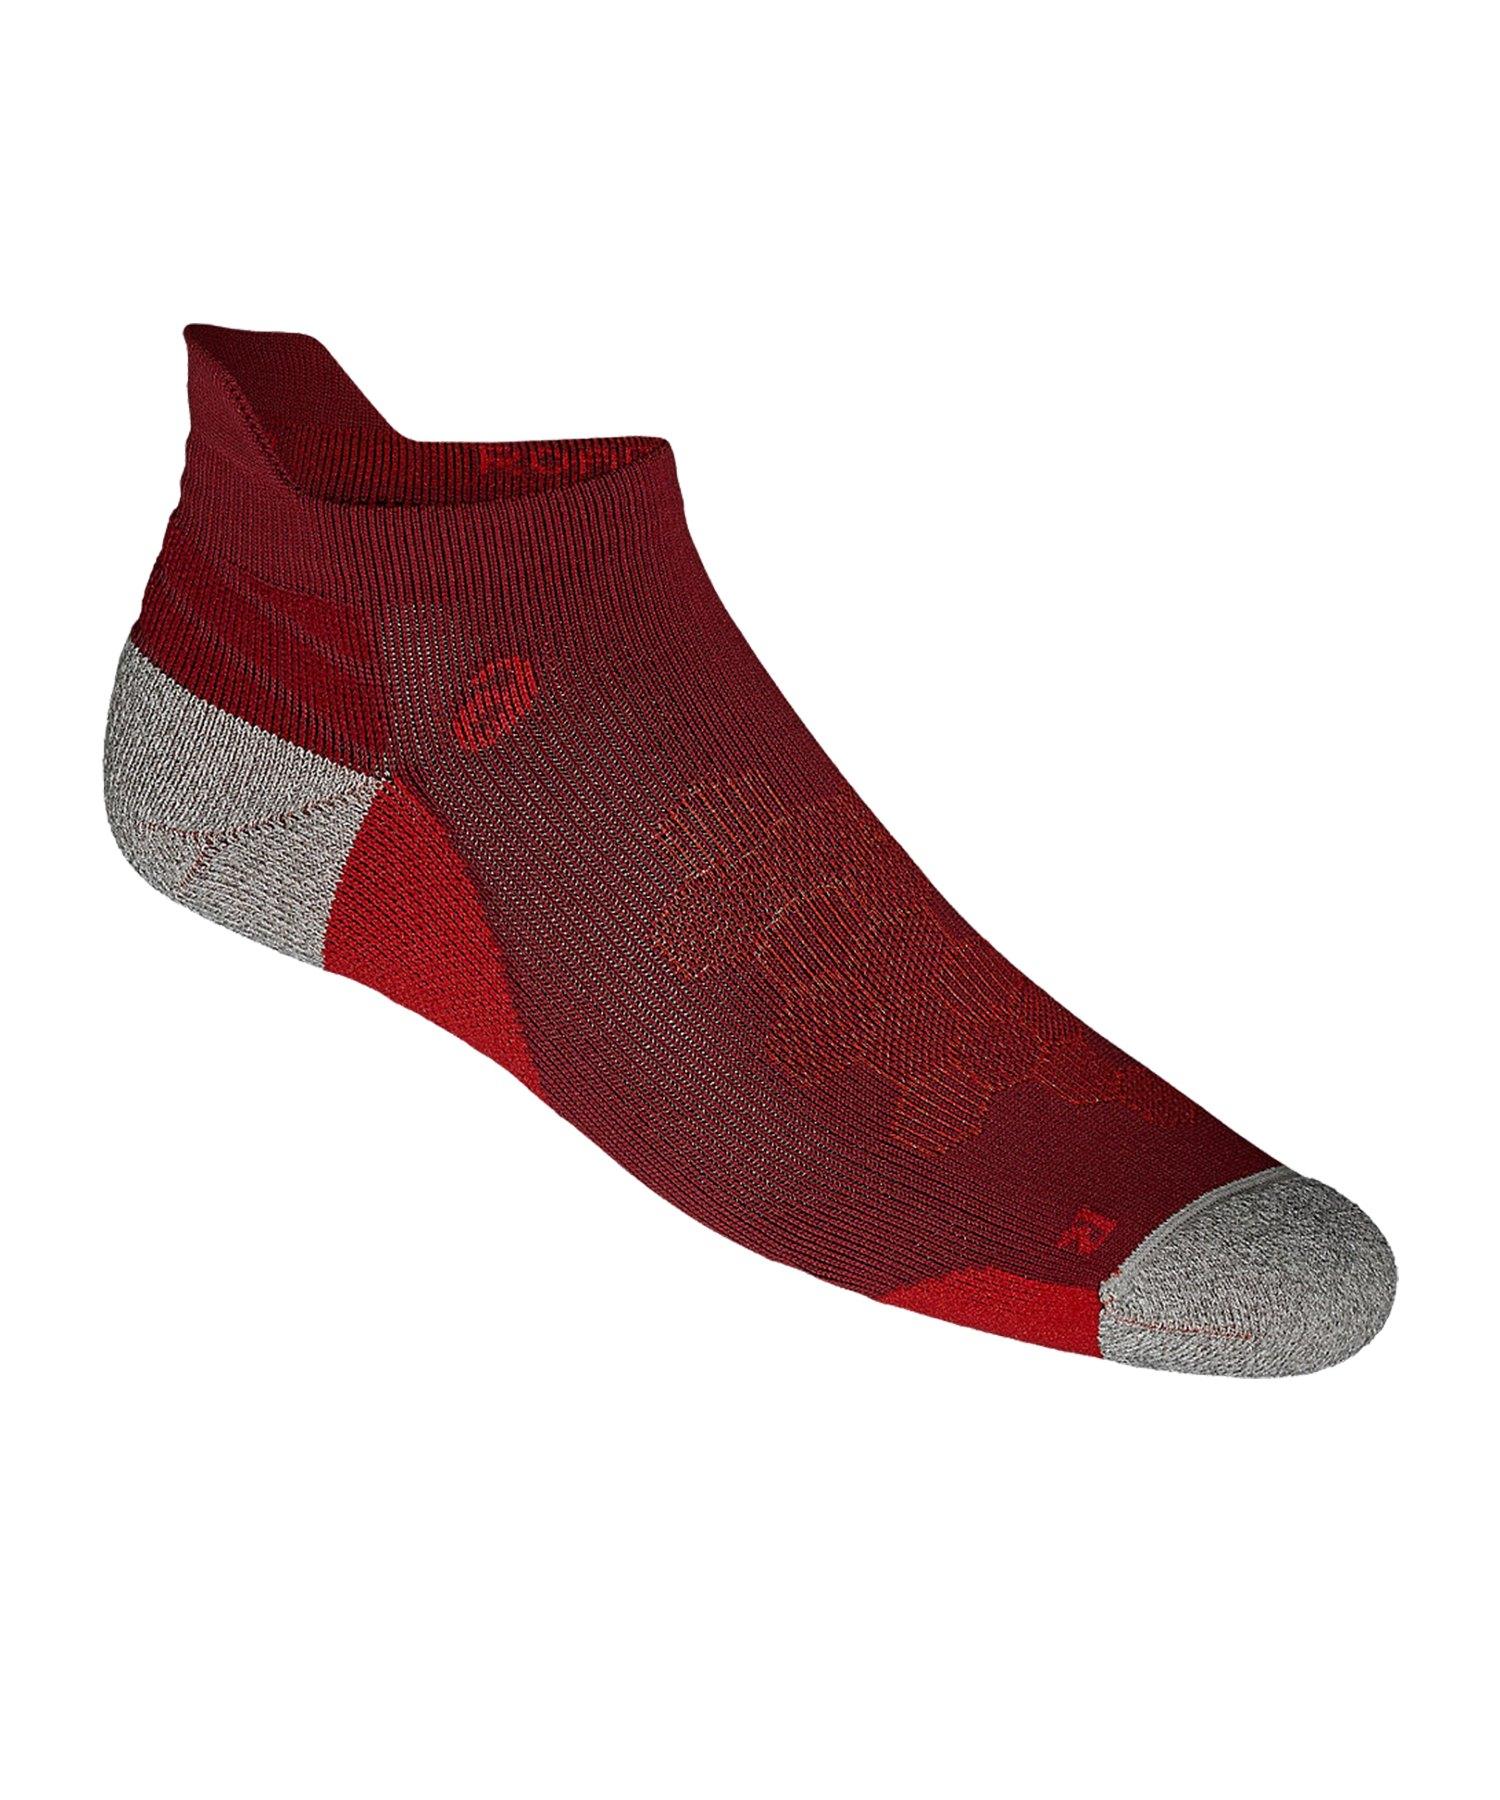 Asics Road Neutral Ankle Single Tab Socken F633